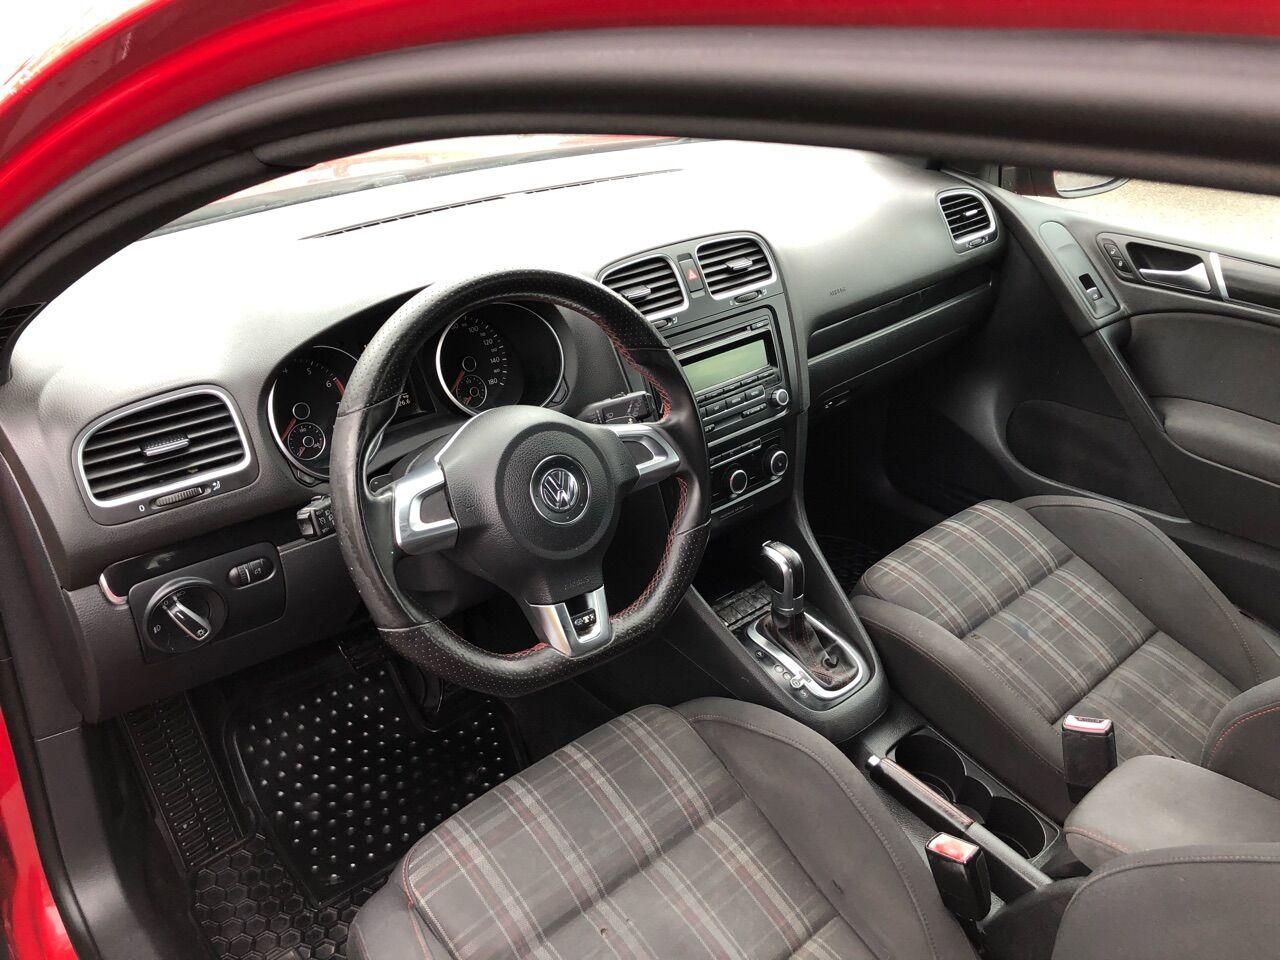 2012 Volkswagen GTI Hatchback